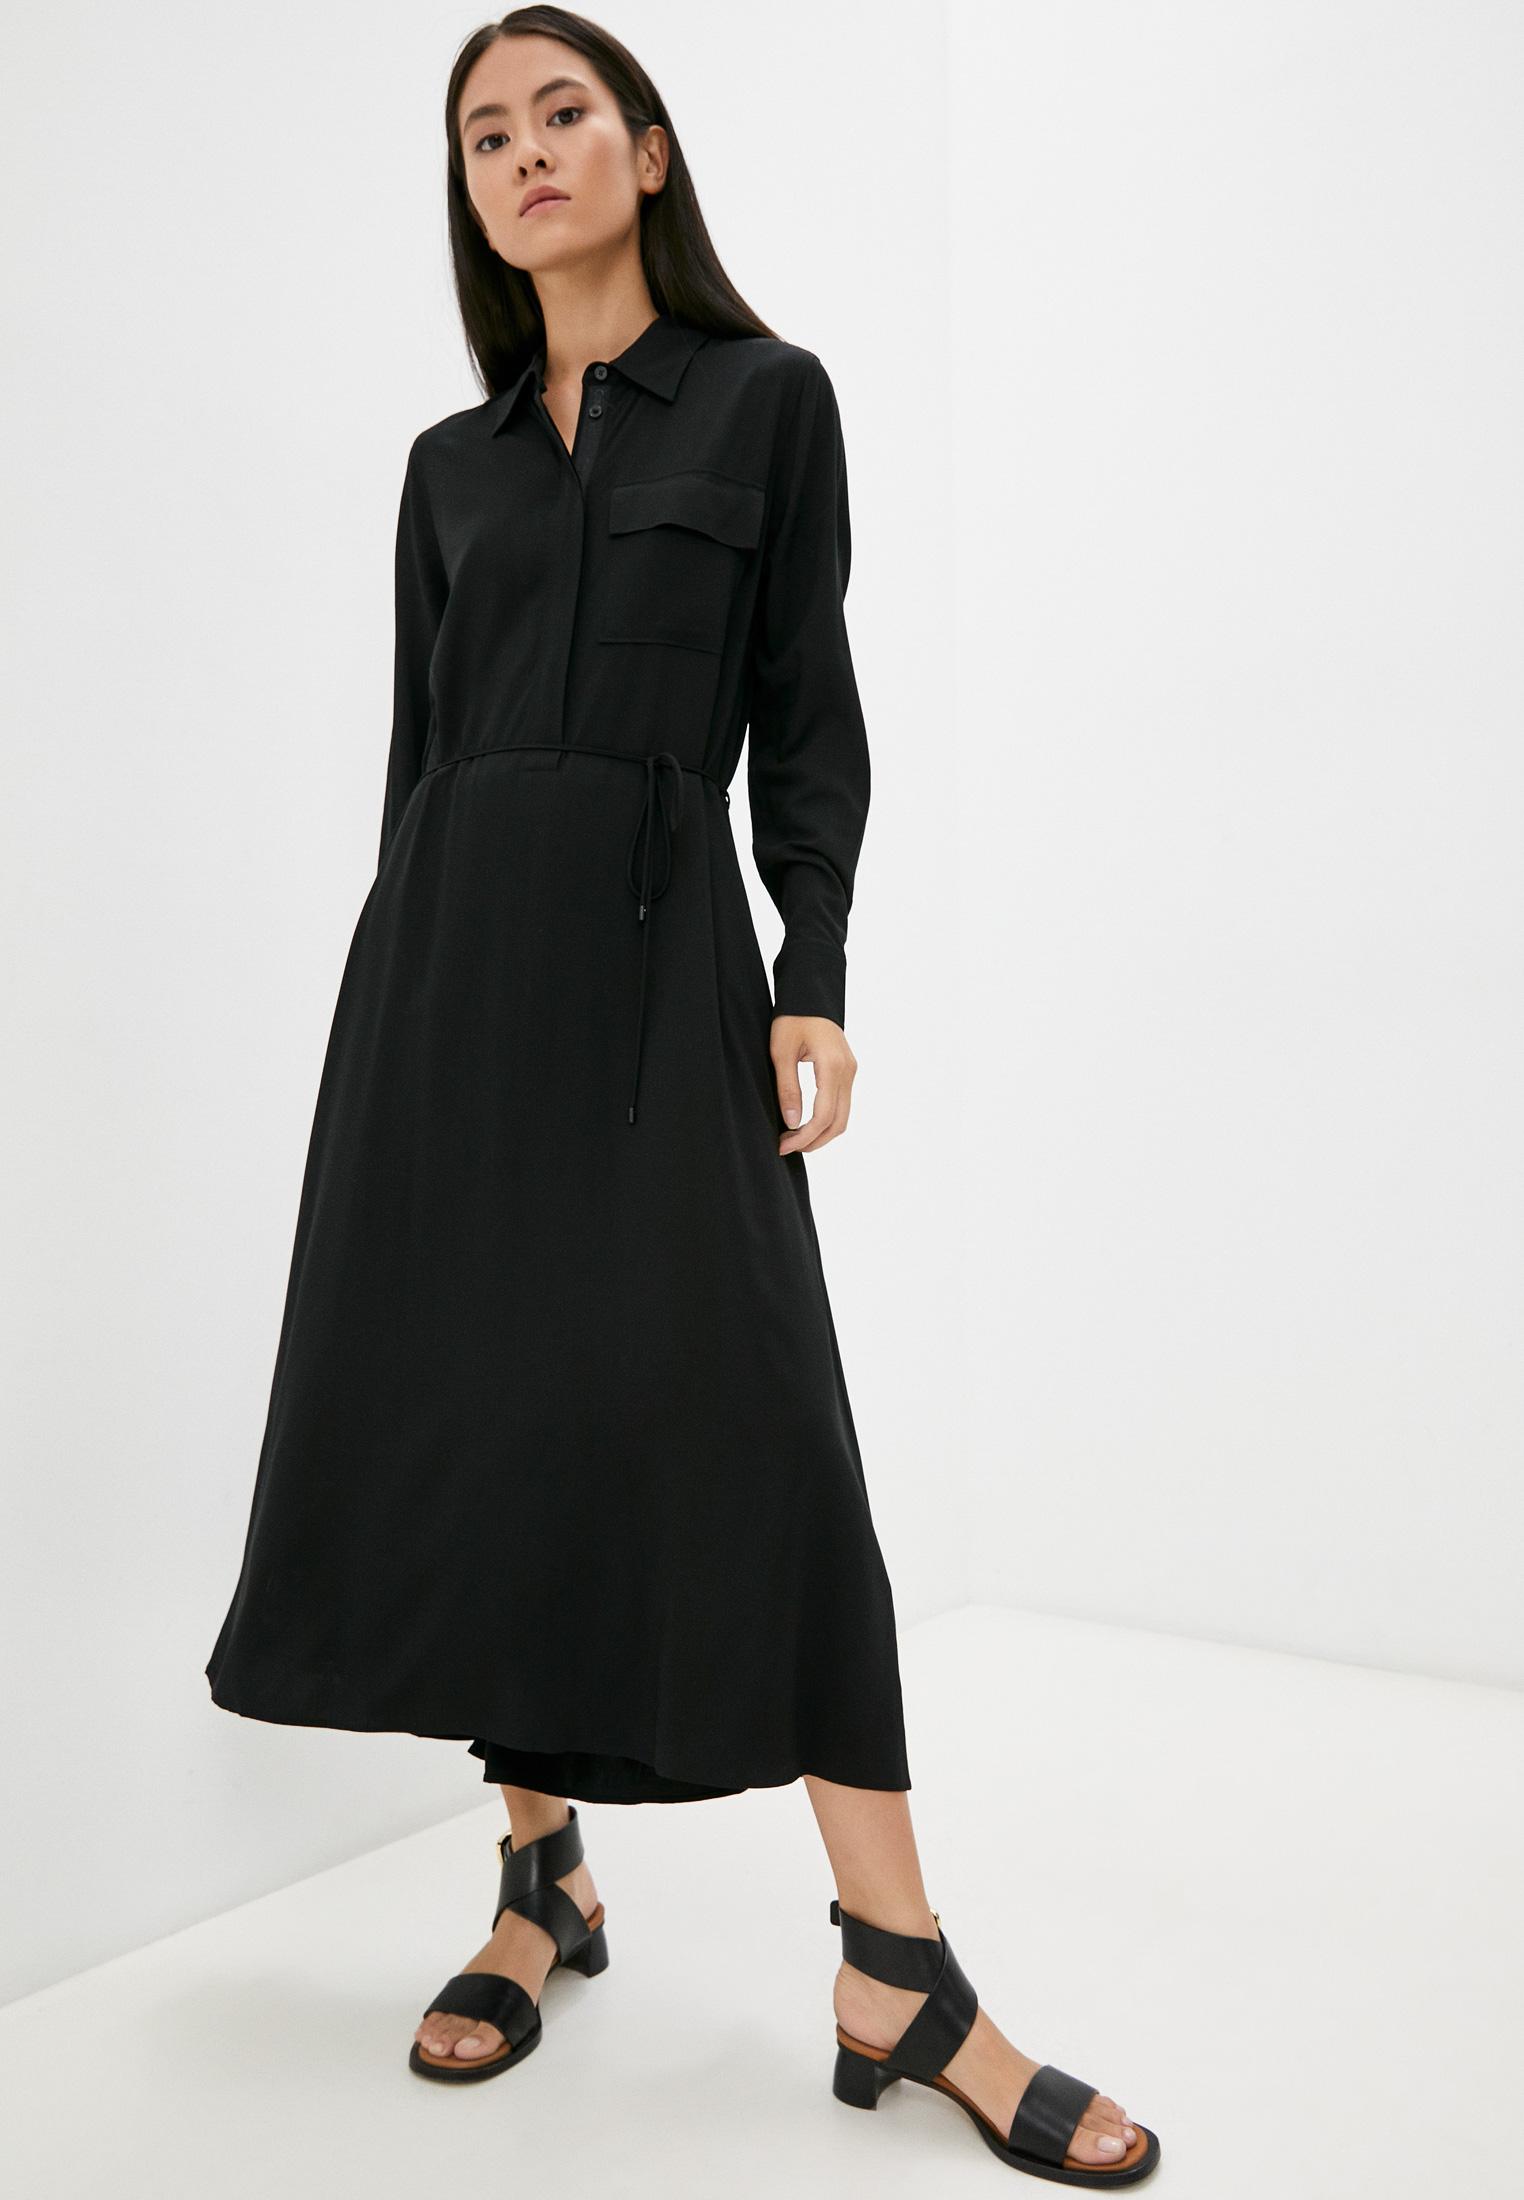 Платье Calvin Klein (Кельвин Кляйн) Платье Calvin Klein